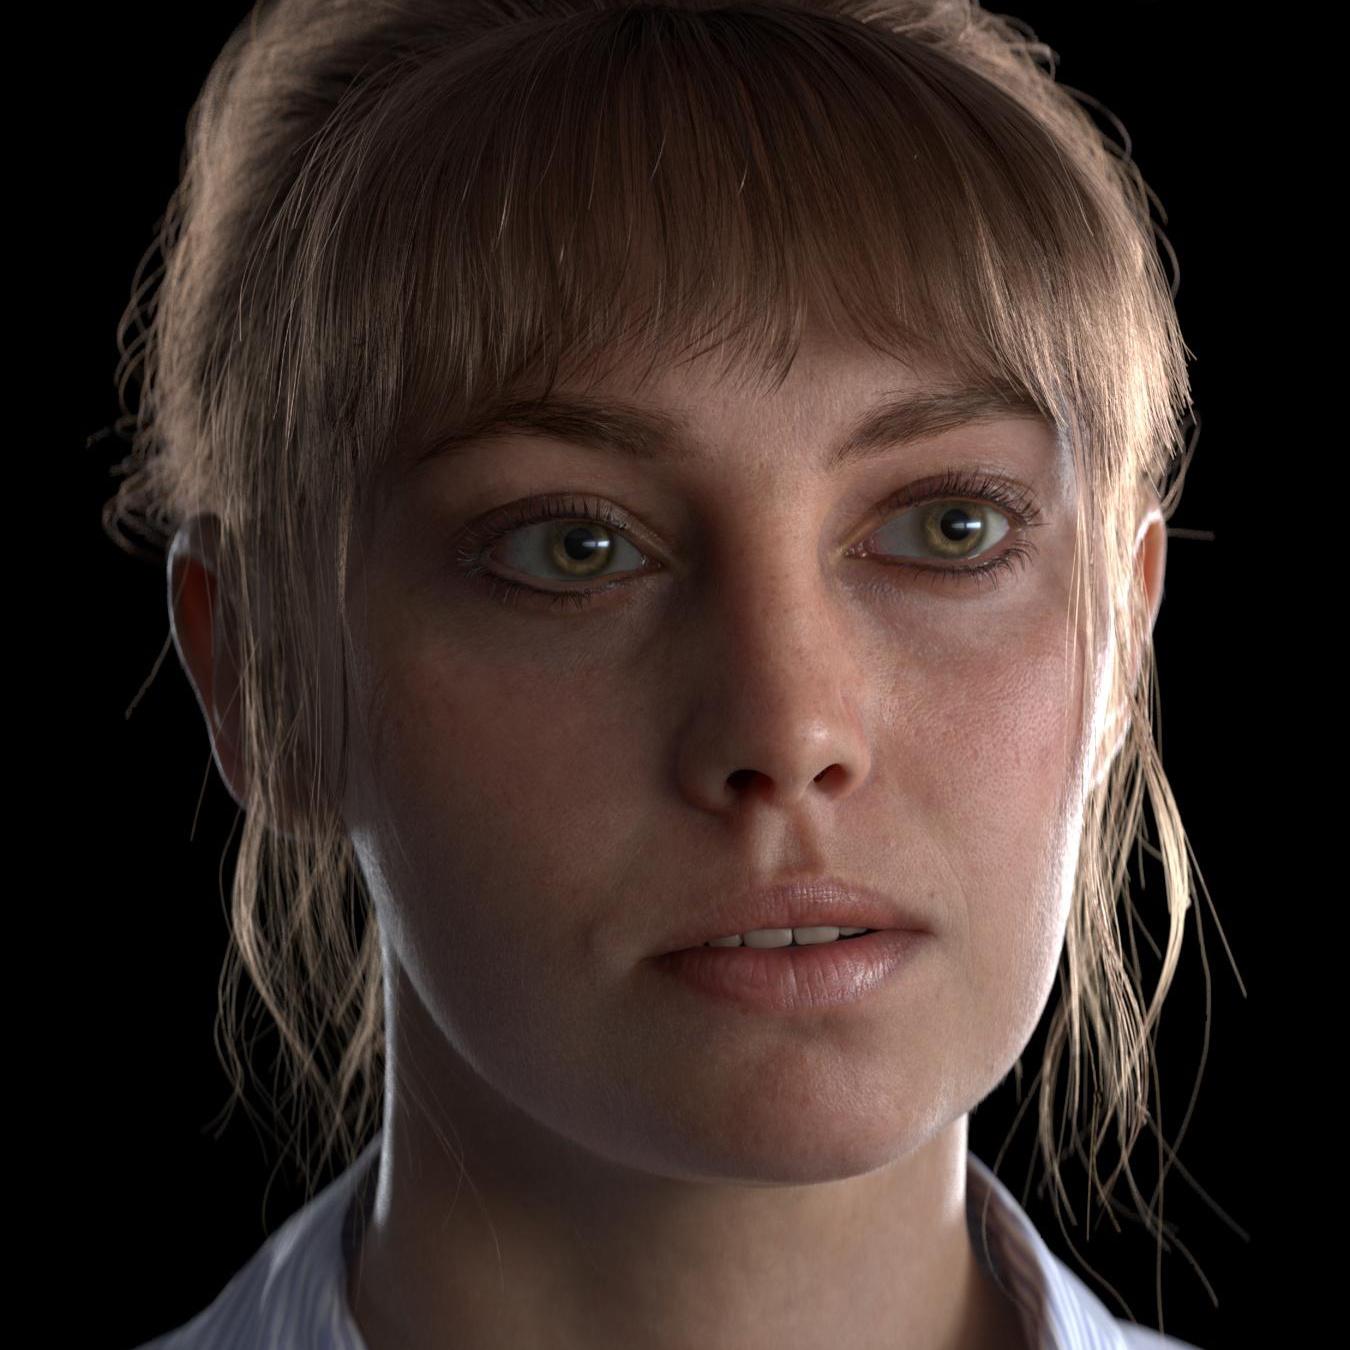 realistic close up model raw render no grading